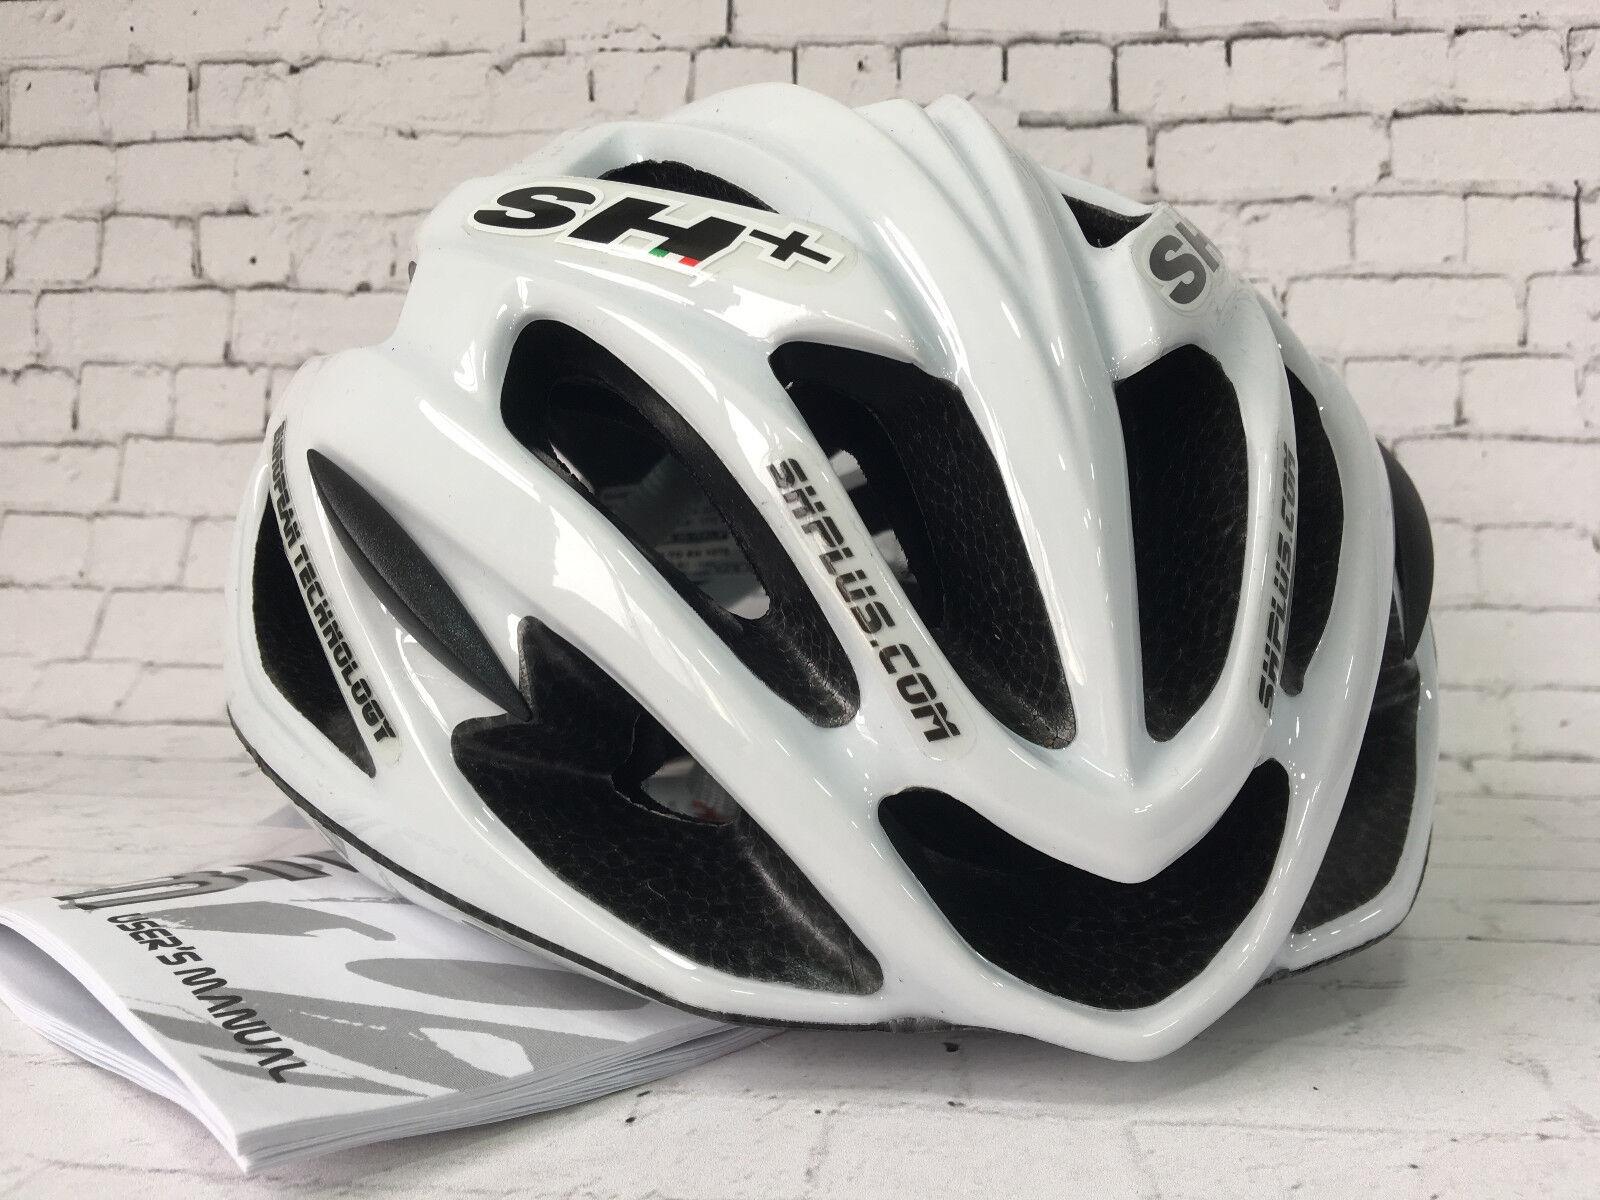 SH + shabli S - 55-60cm (Carretera Ciclismo Casco Line blancoo Brillante)